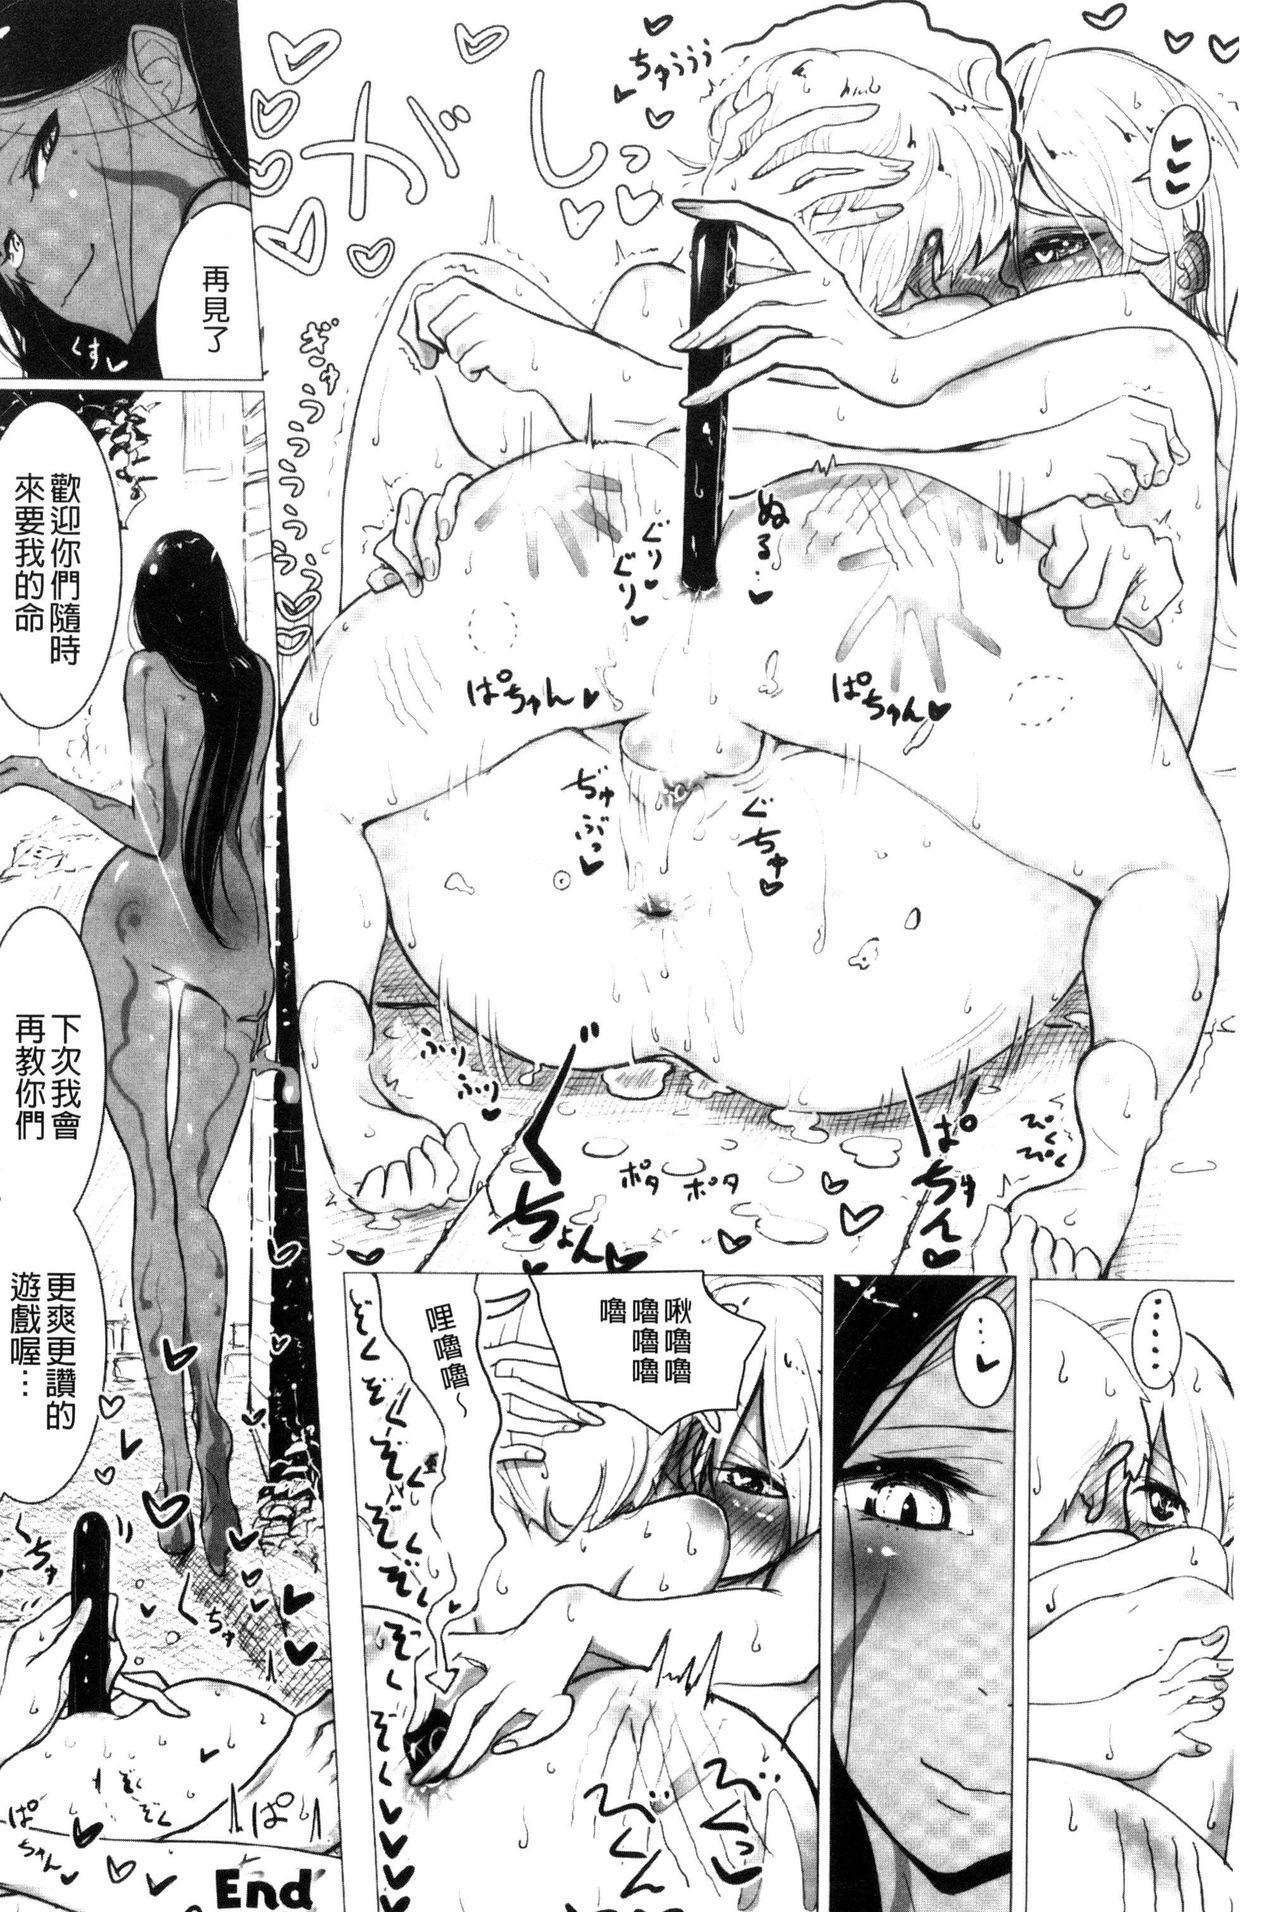 [Dhibi] Sono Yubisaki de Korogashite - Please Caress it at the Finger-tip. [Chinese] 155